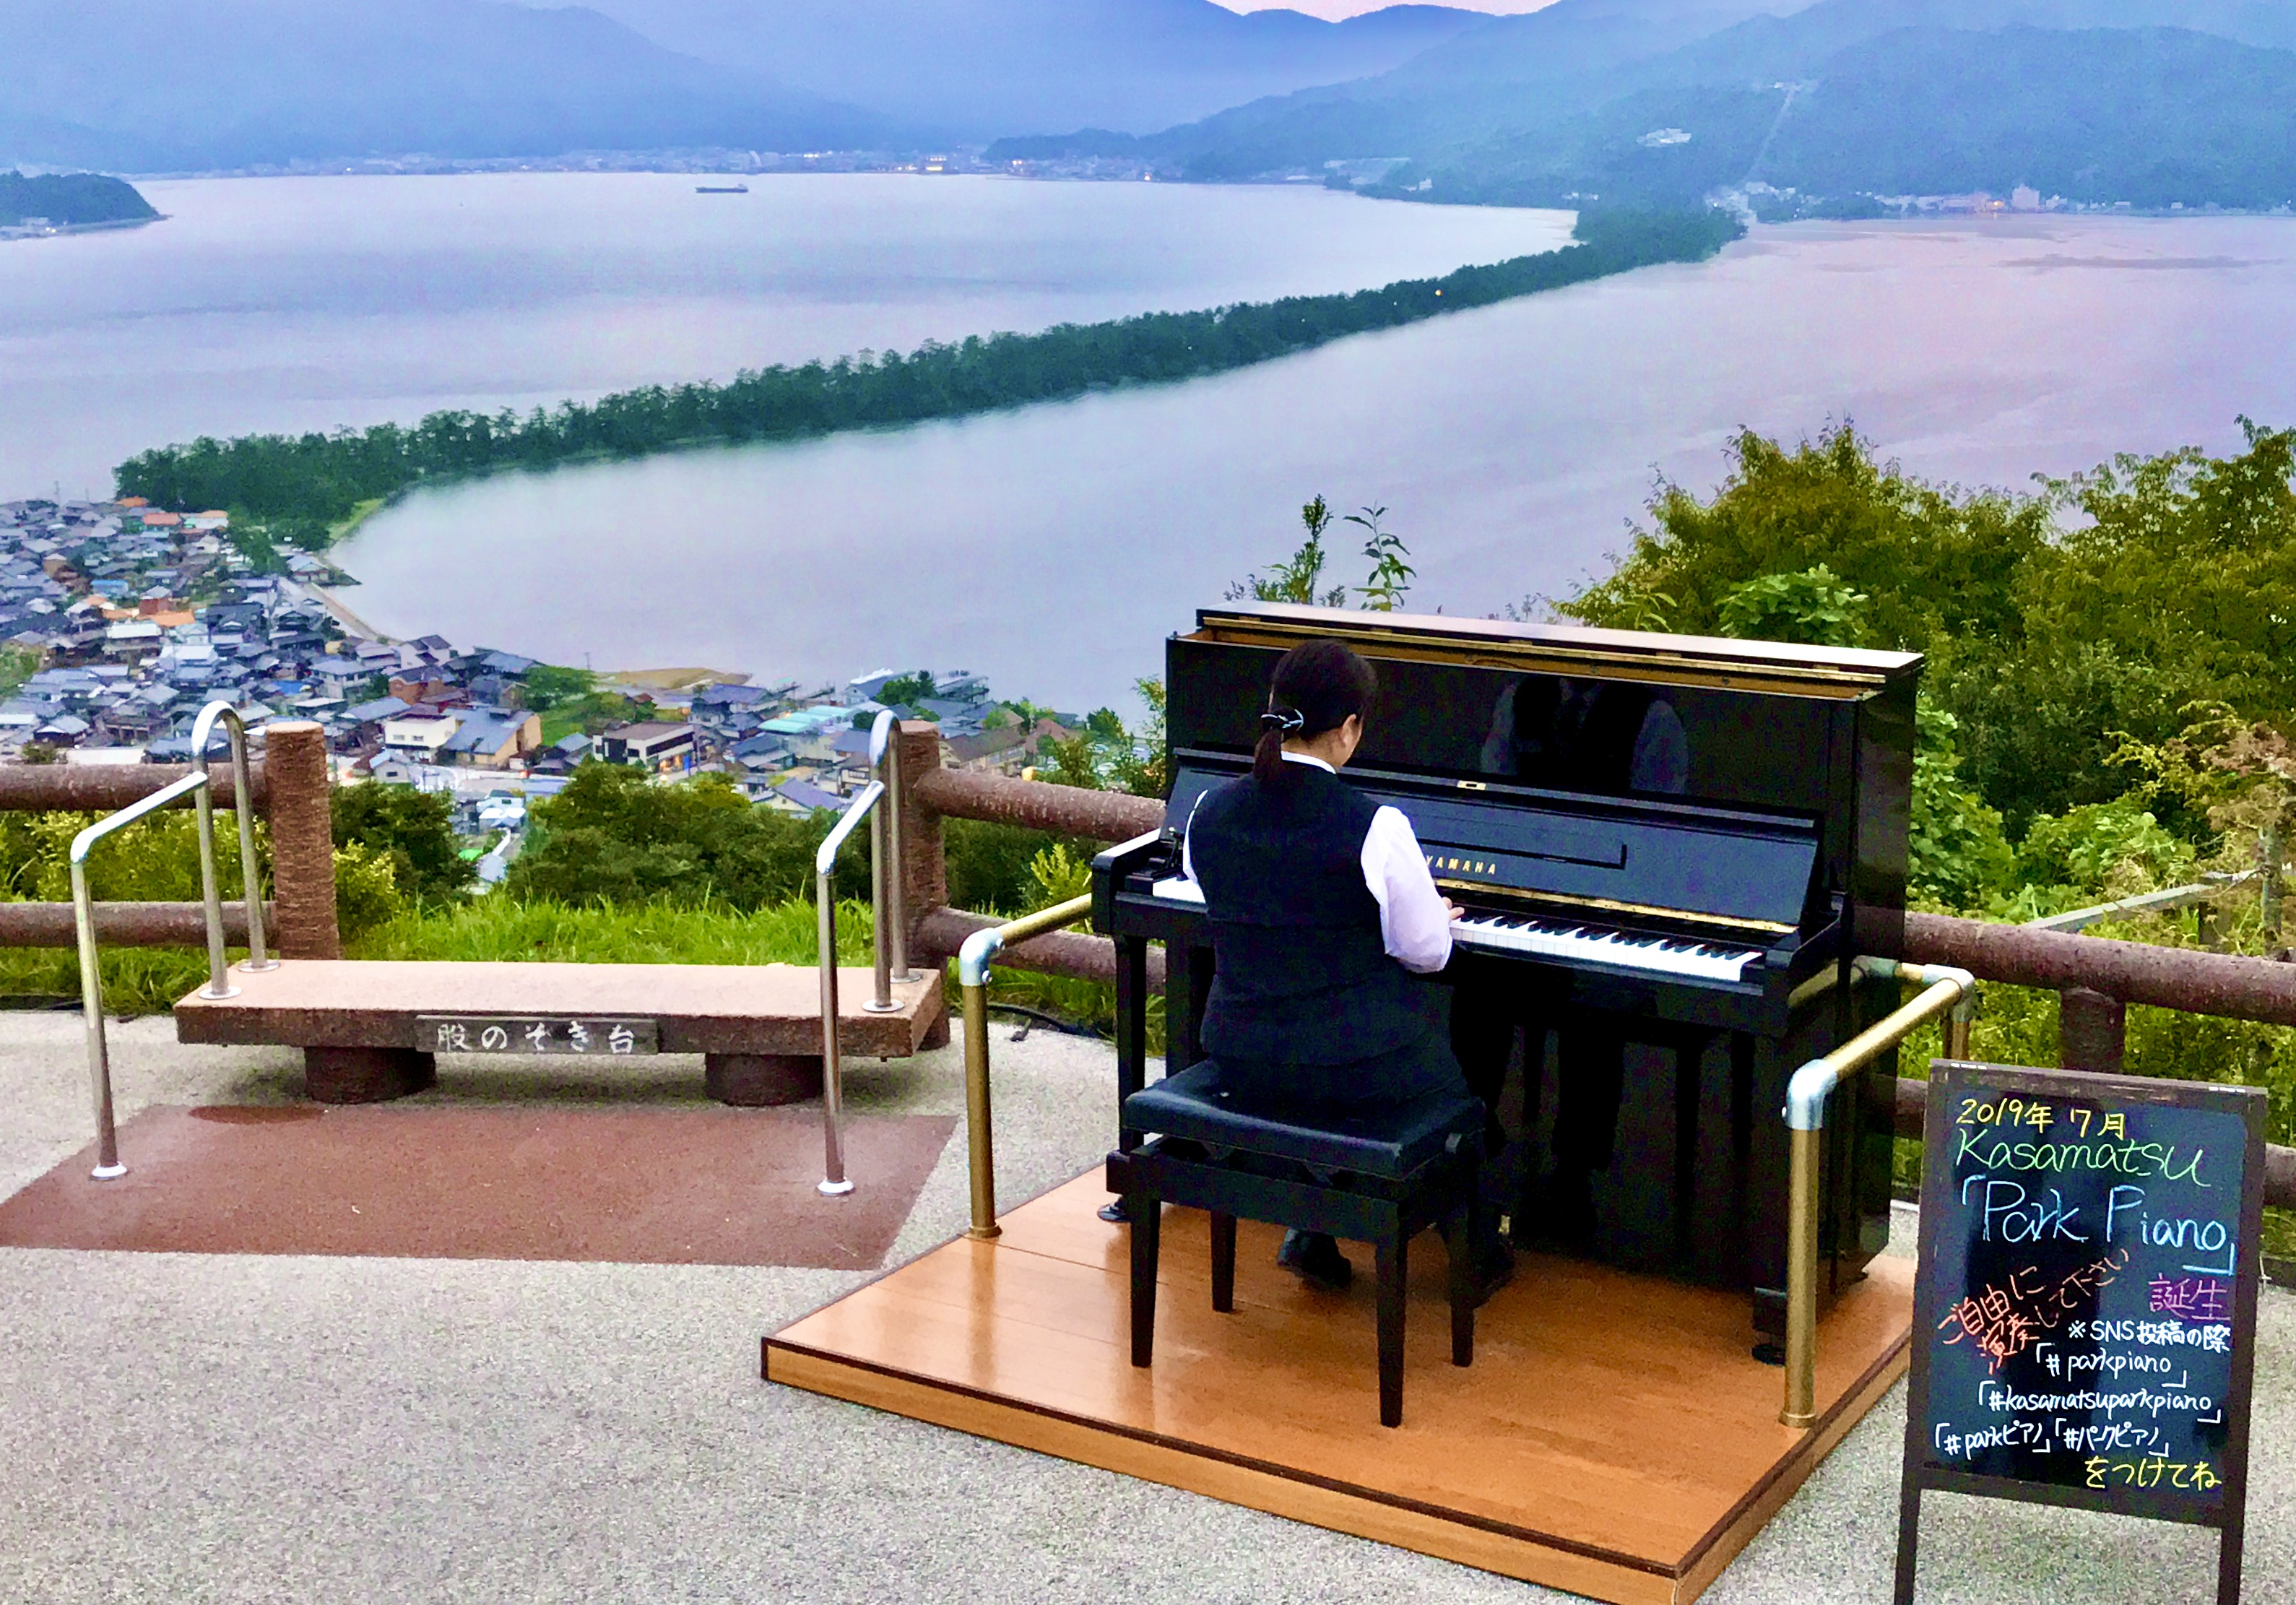 kasamatsu park piano